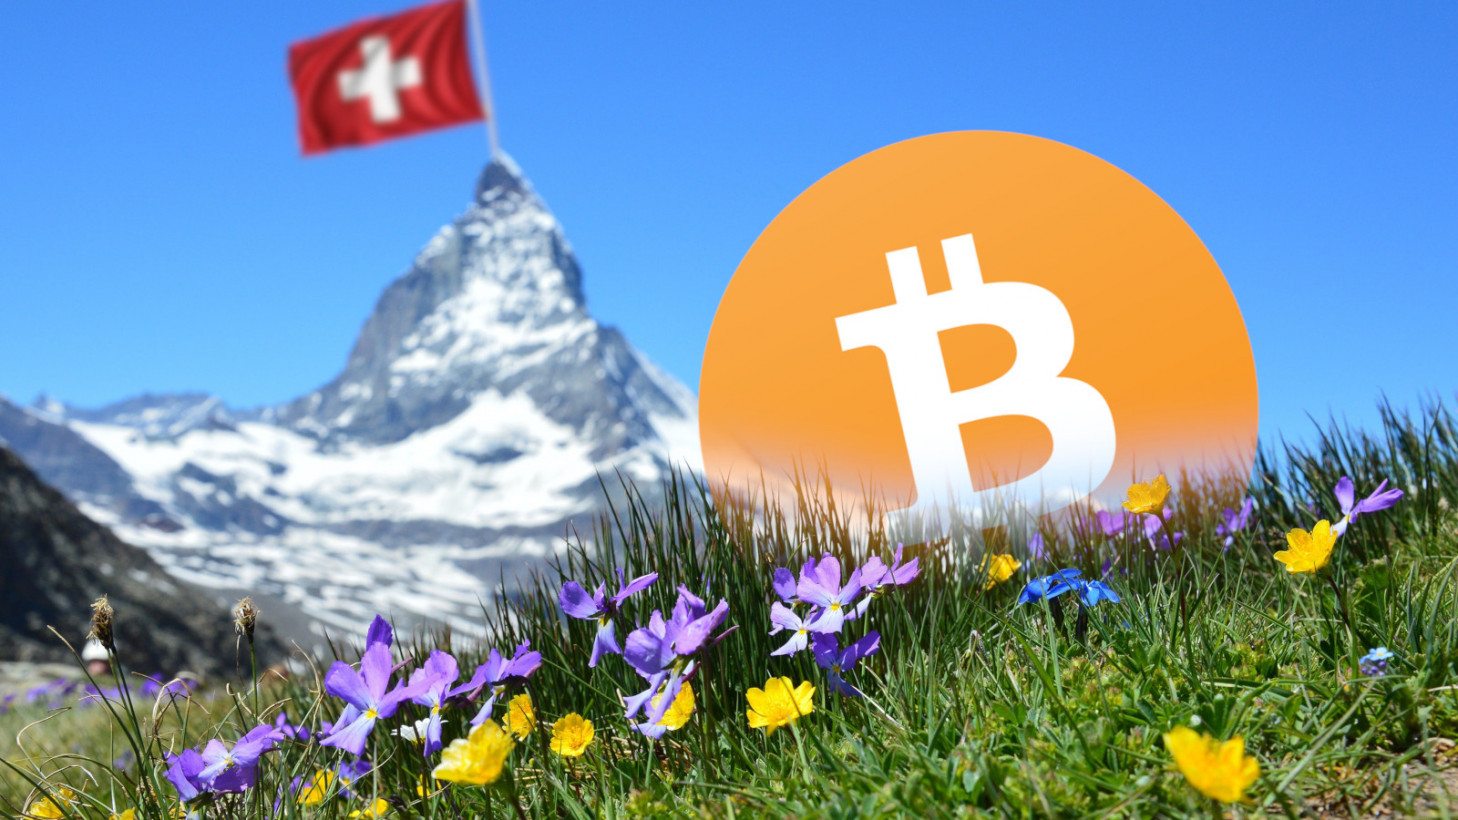 thenextweb.com - Matthew Beedham - Switzerland sets precedent with world's first cryptocurrency ETP